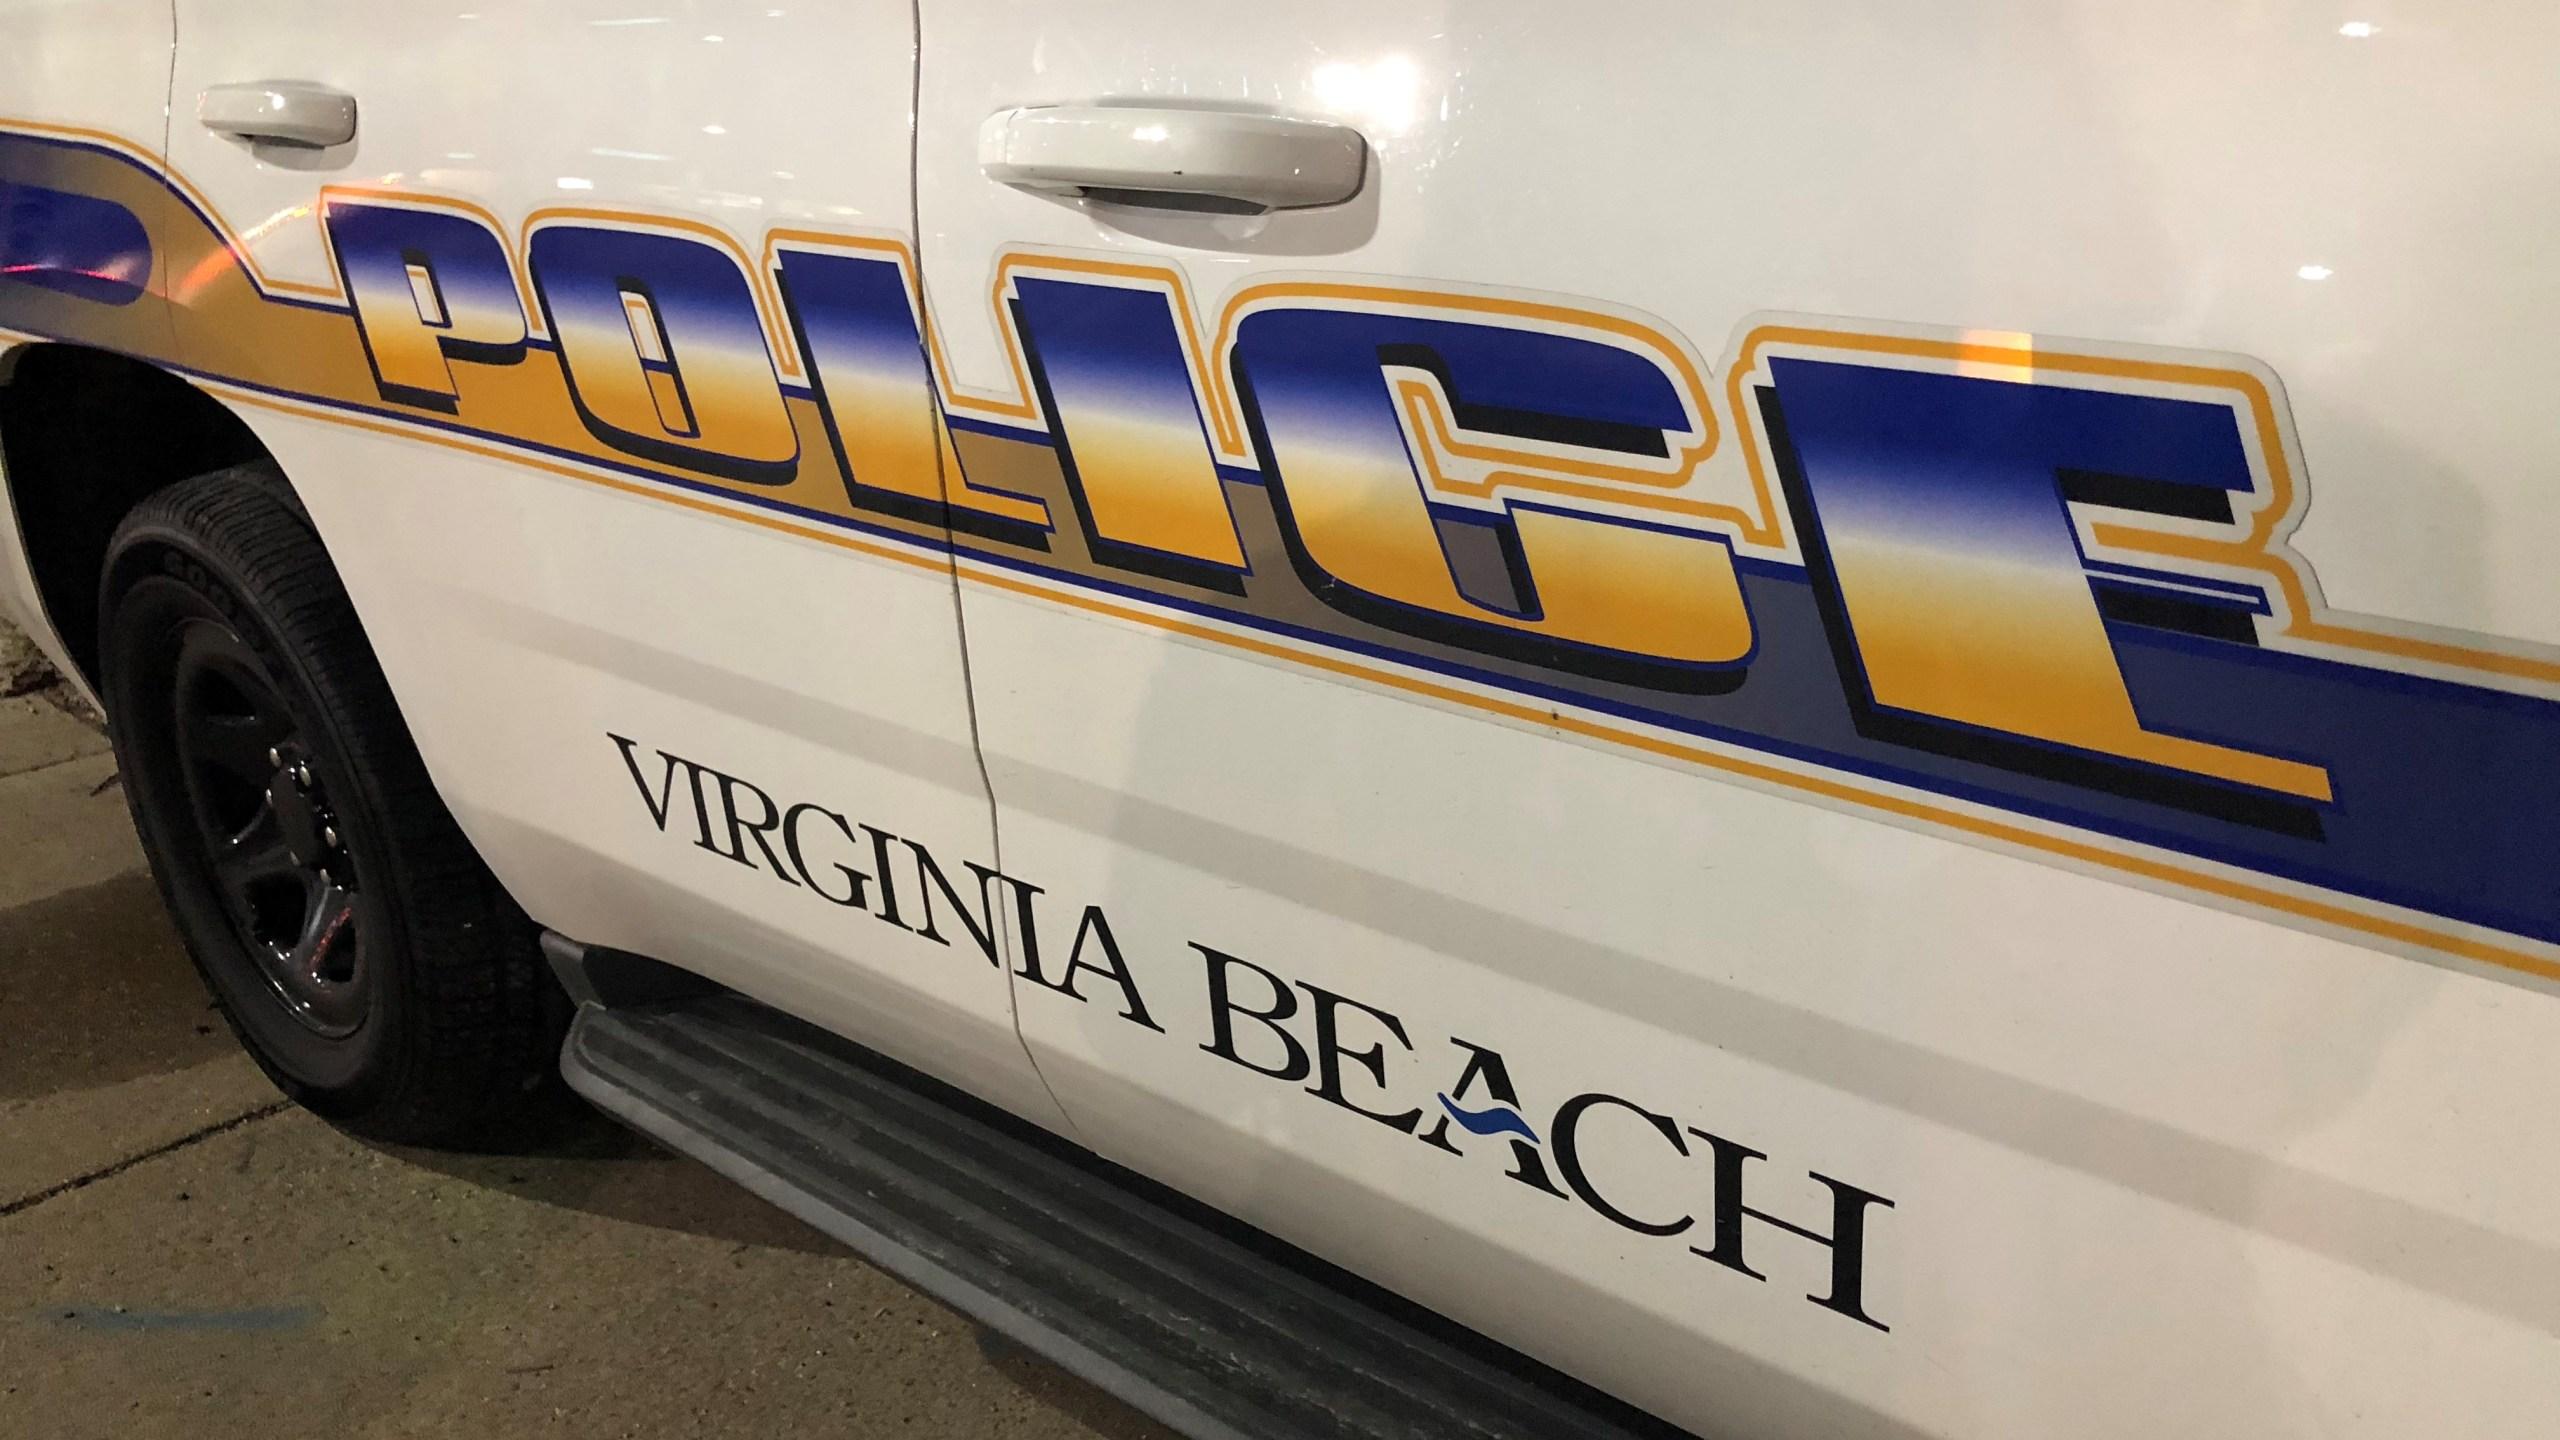 Virginia Beach Police Generic_1524974050710.jpg.jpg